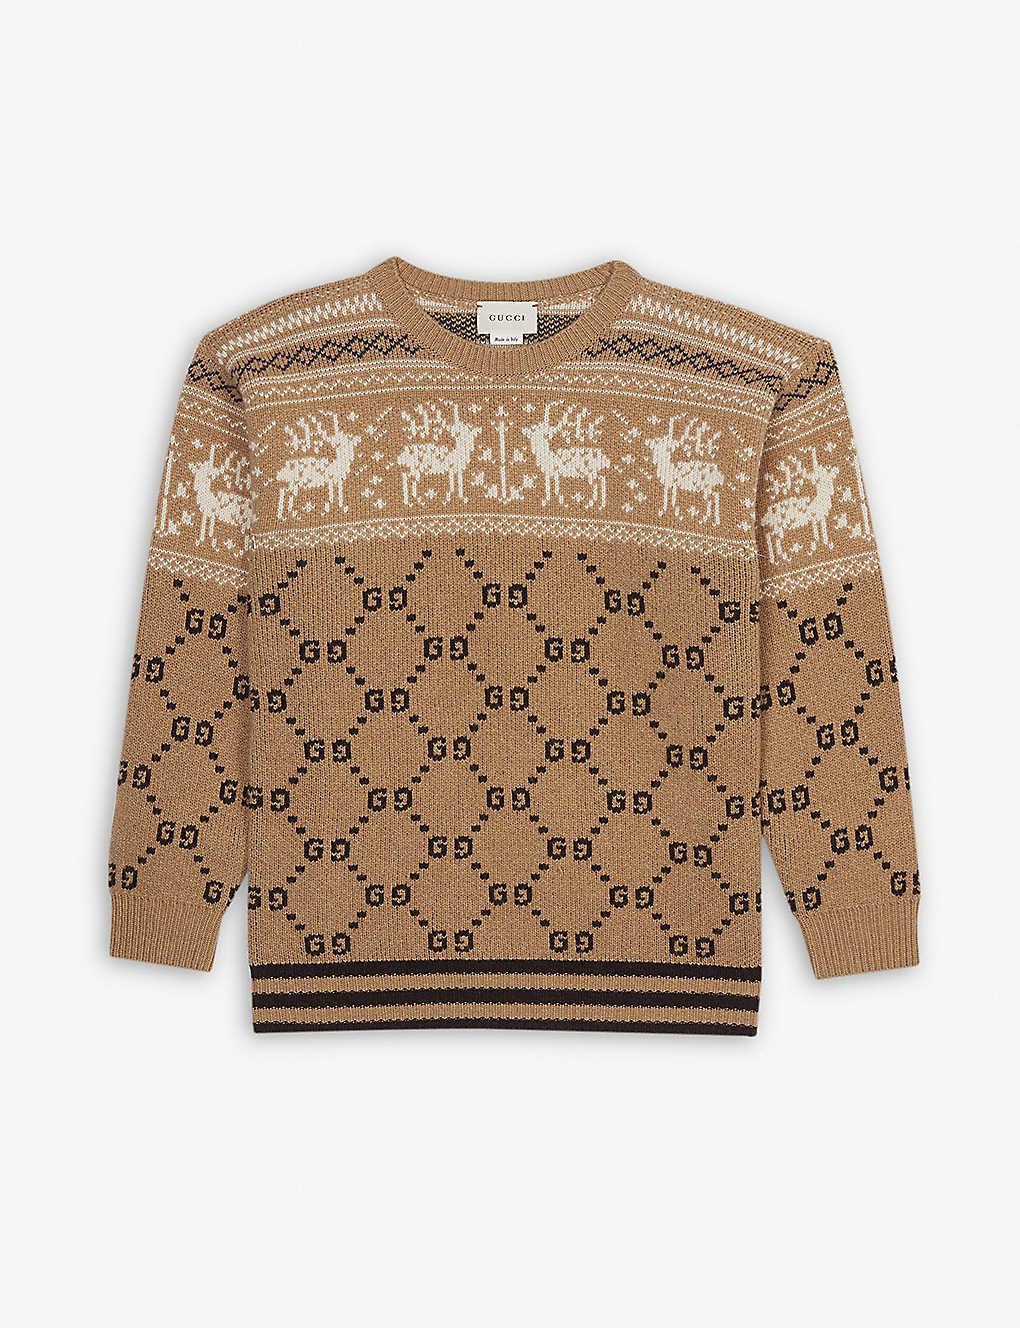 0583cc3b8b8f1 GUCCI - Reindeer Fair Isle wool jumper 8-12 years | Selfridges.com